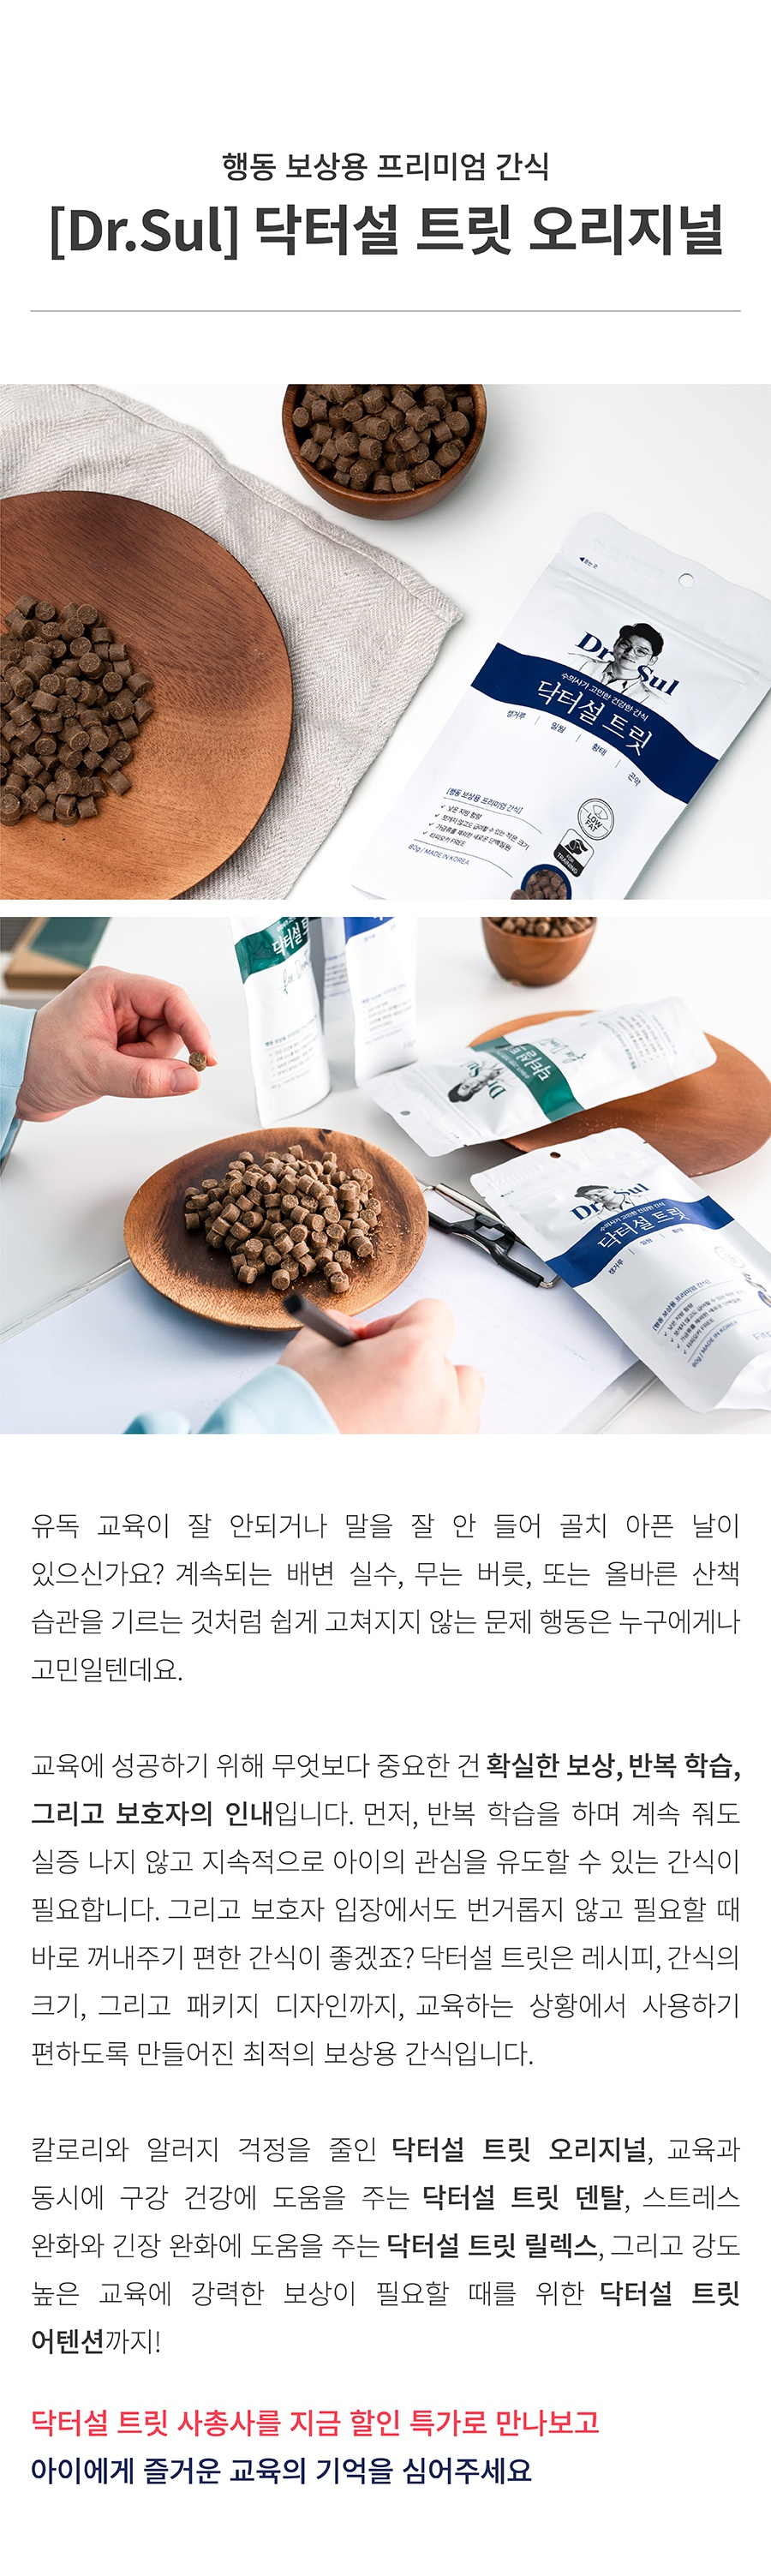 [EVENT] 닥터설 트릿-상품이미지-1